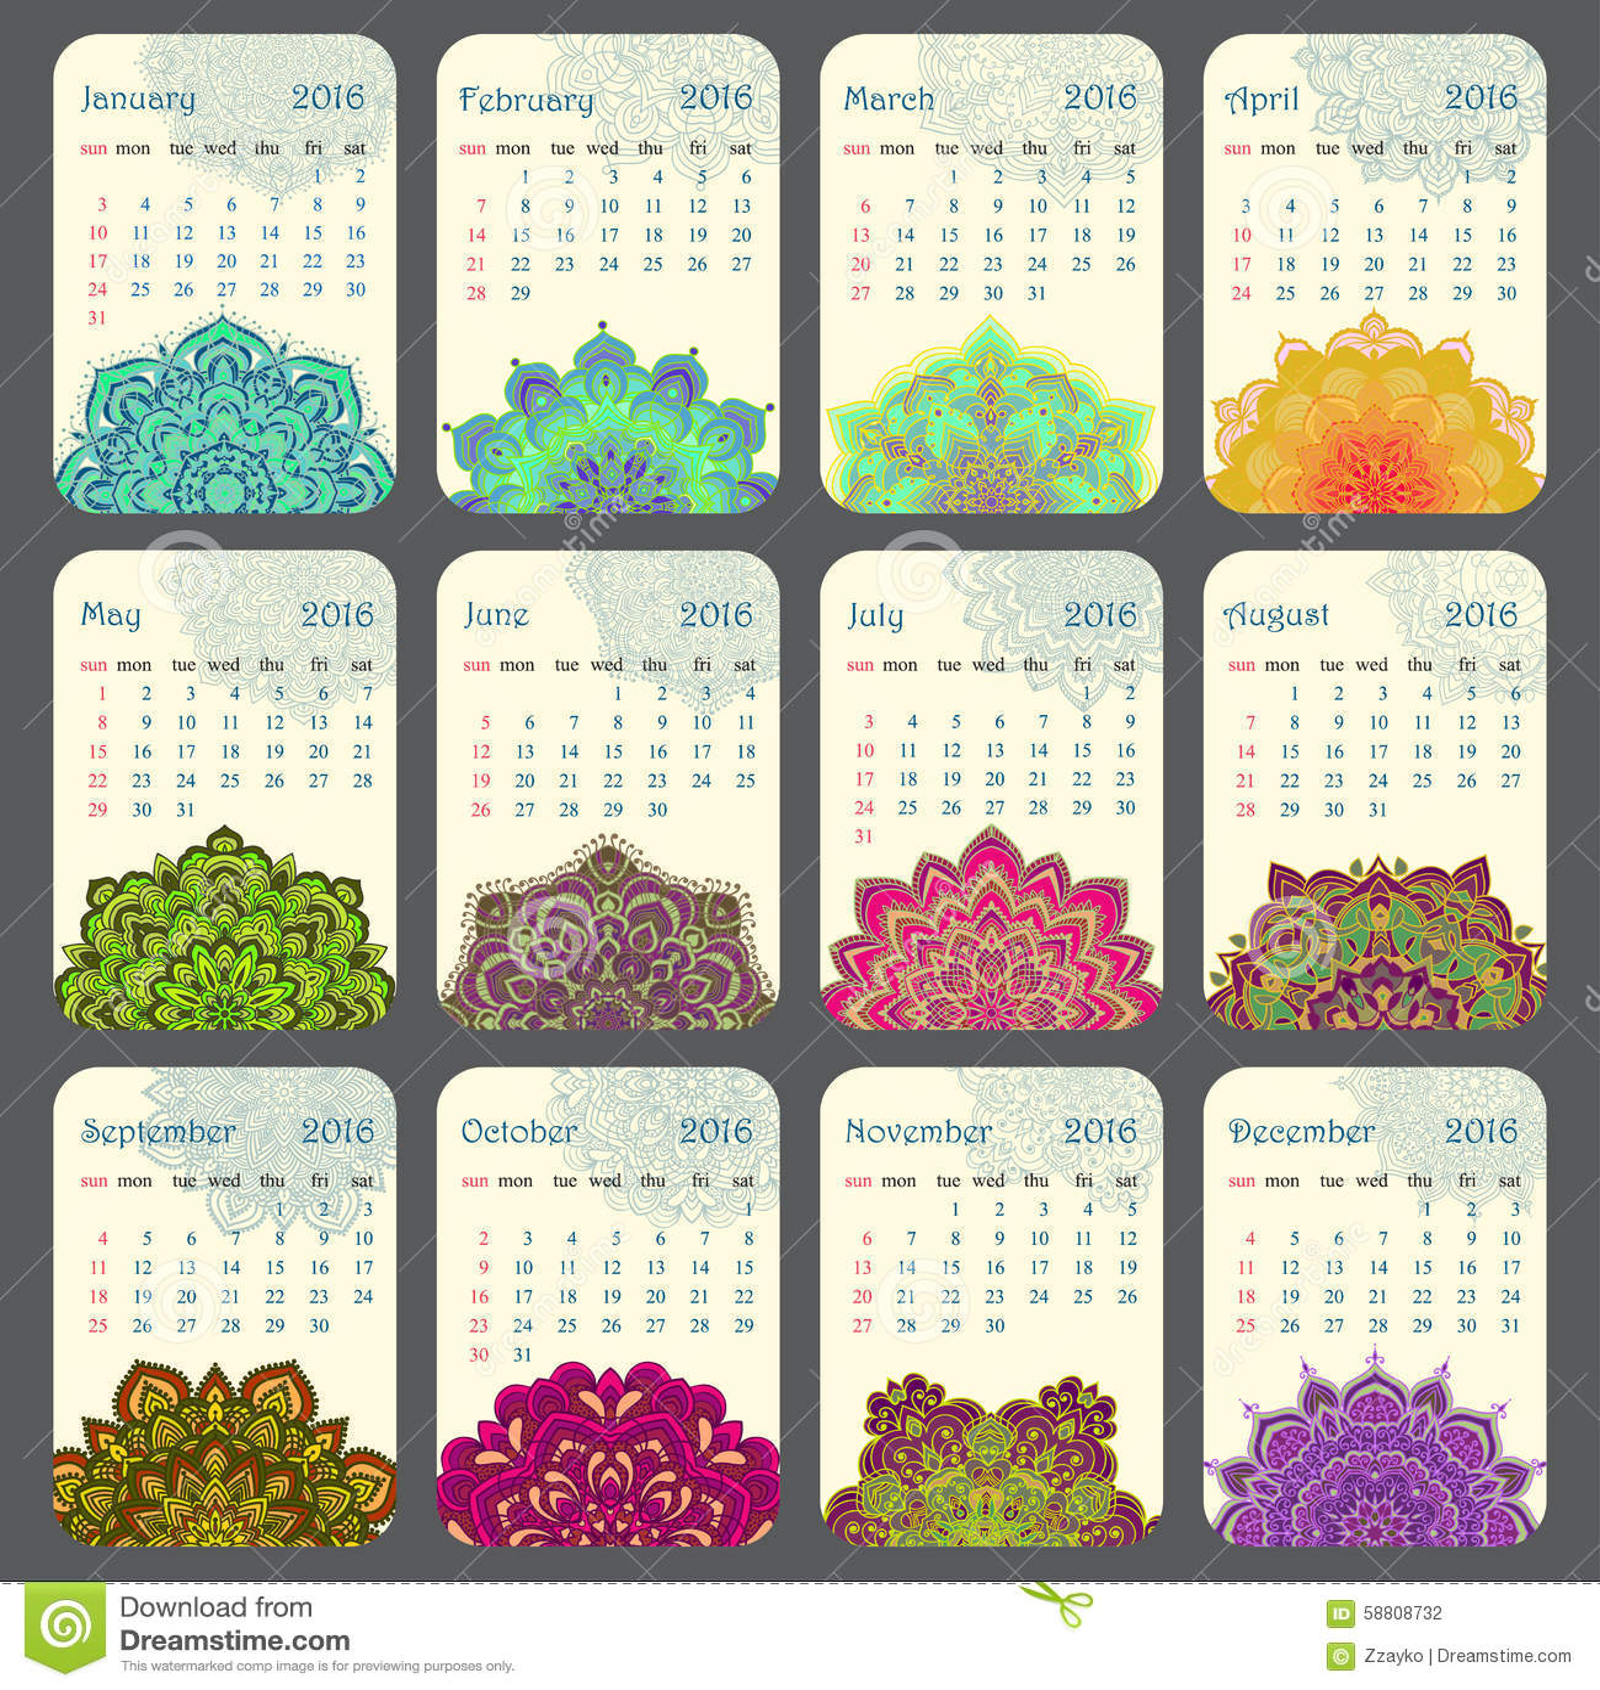 Calendar Illustration Ideas : Calendar decorated with circular flower mandala stock